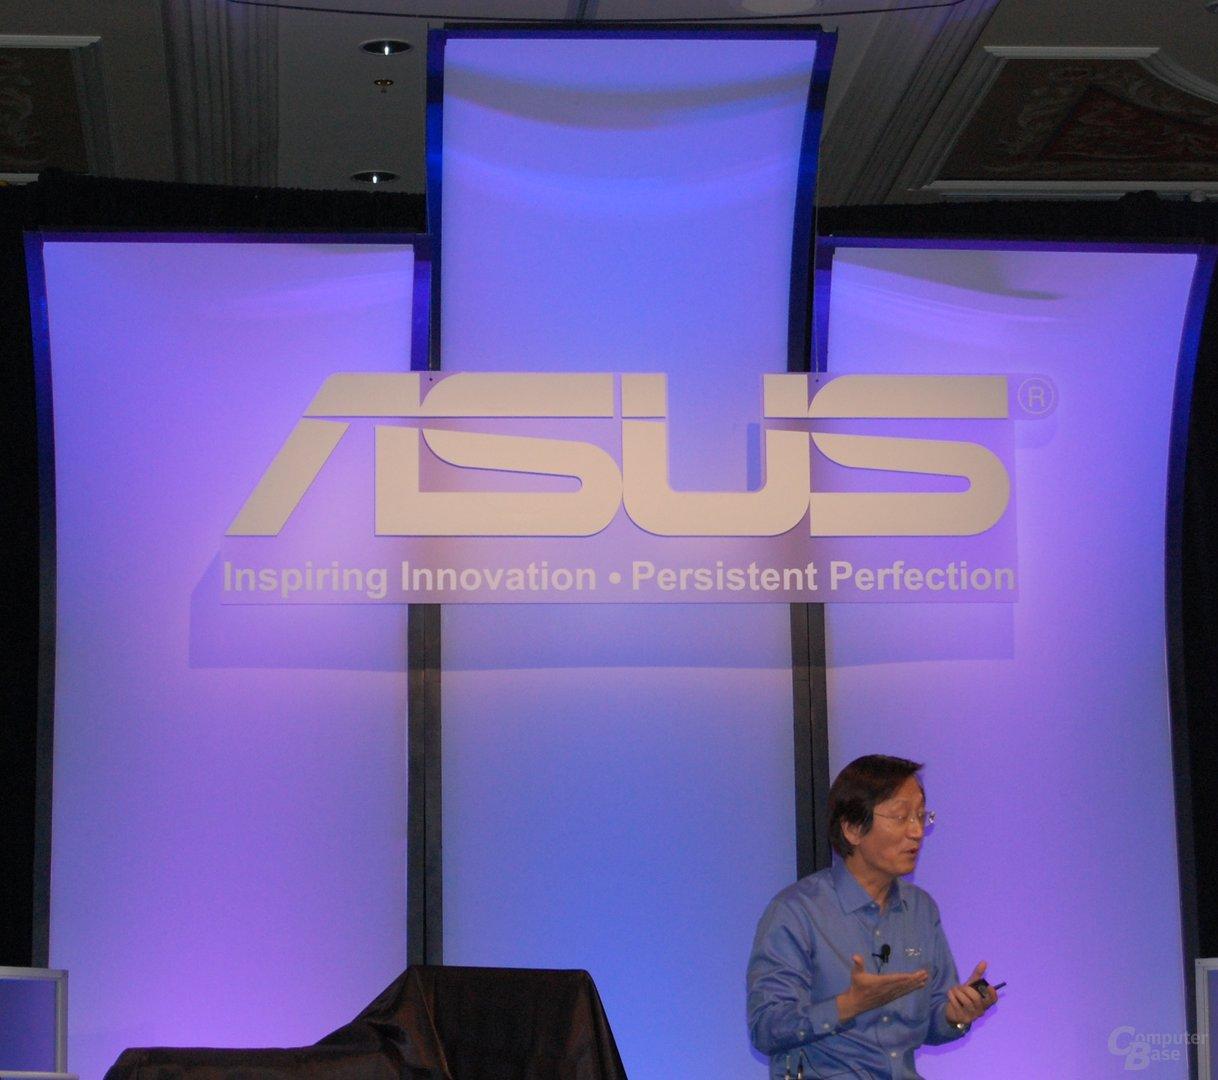 Asus-Chairman Jonney Shih auf der CES 2010